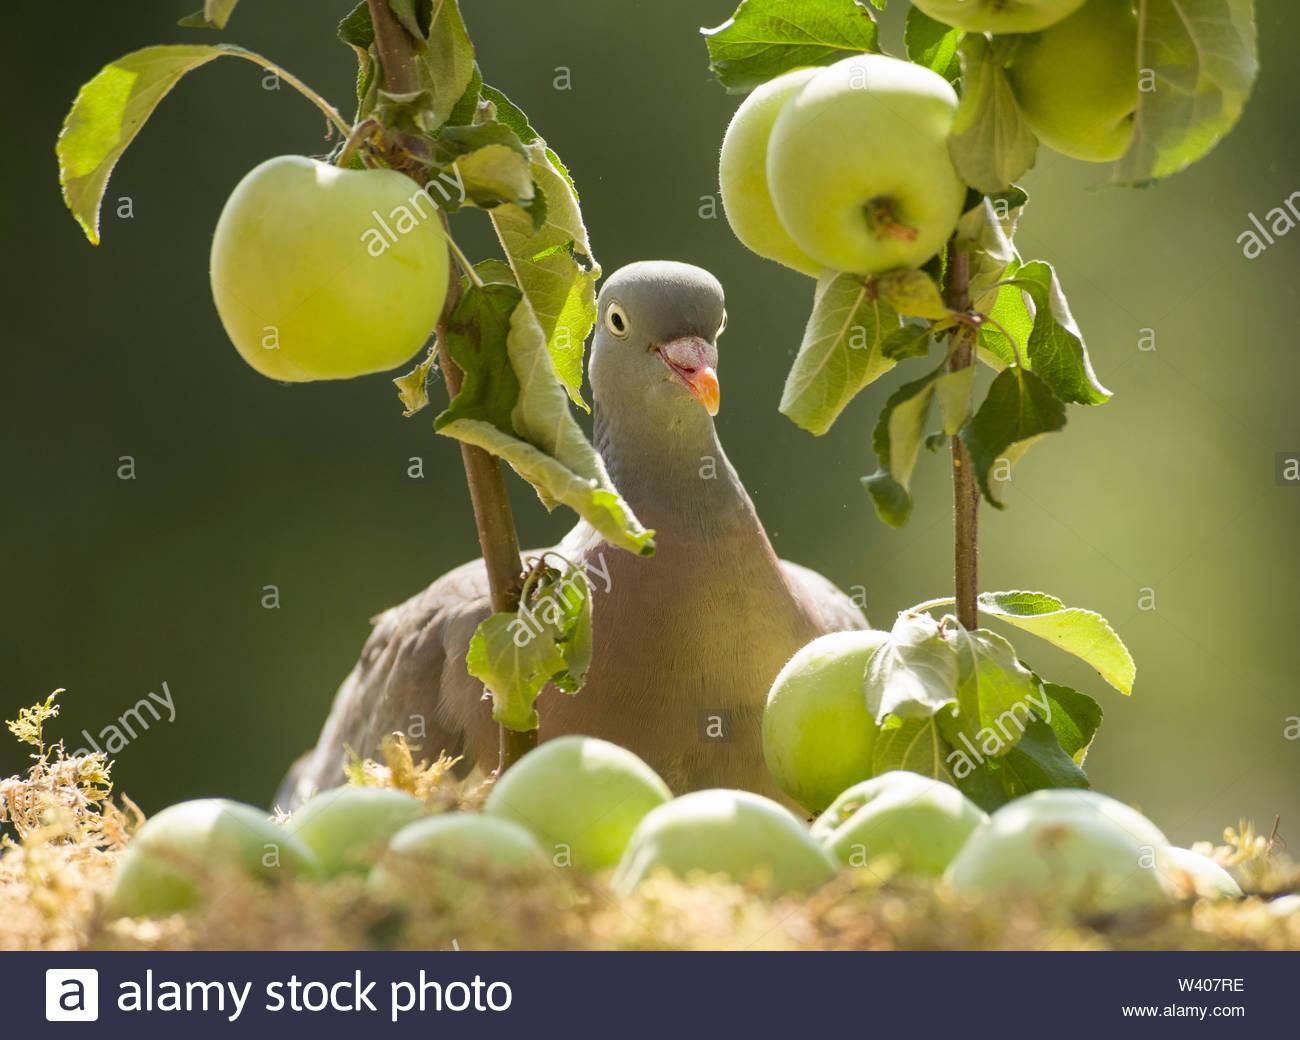 wood pigeon is standing between apple branches - Stock Image